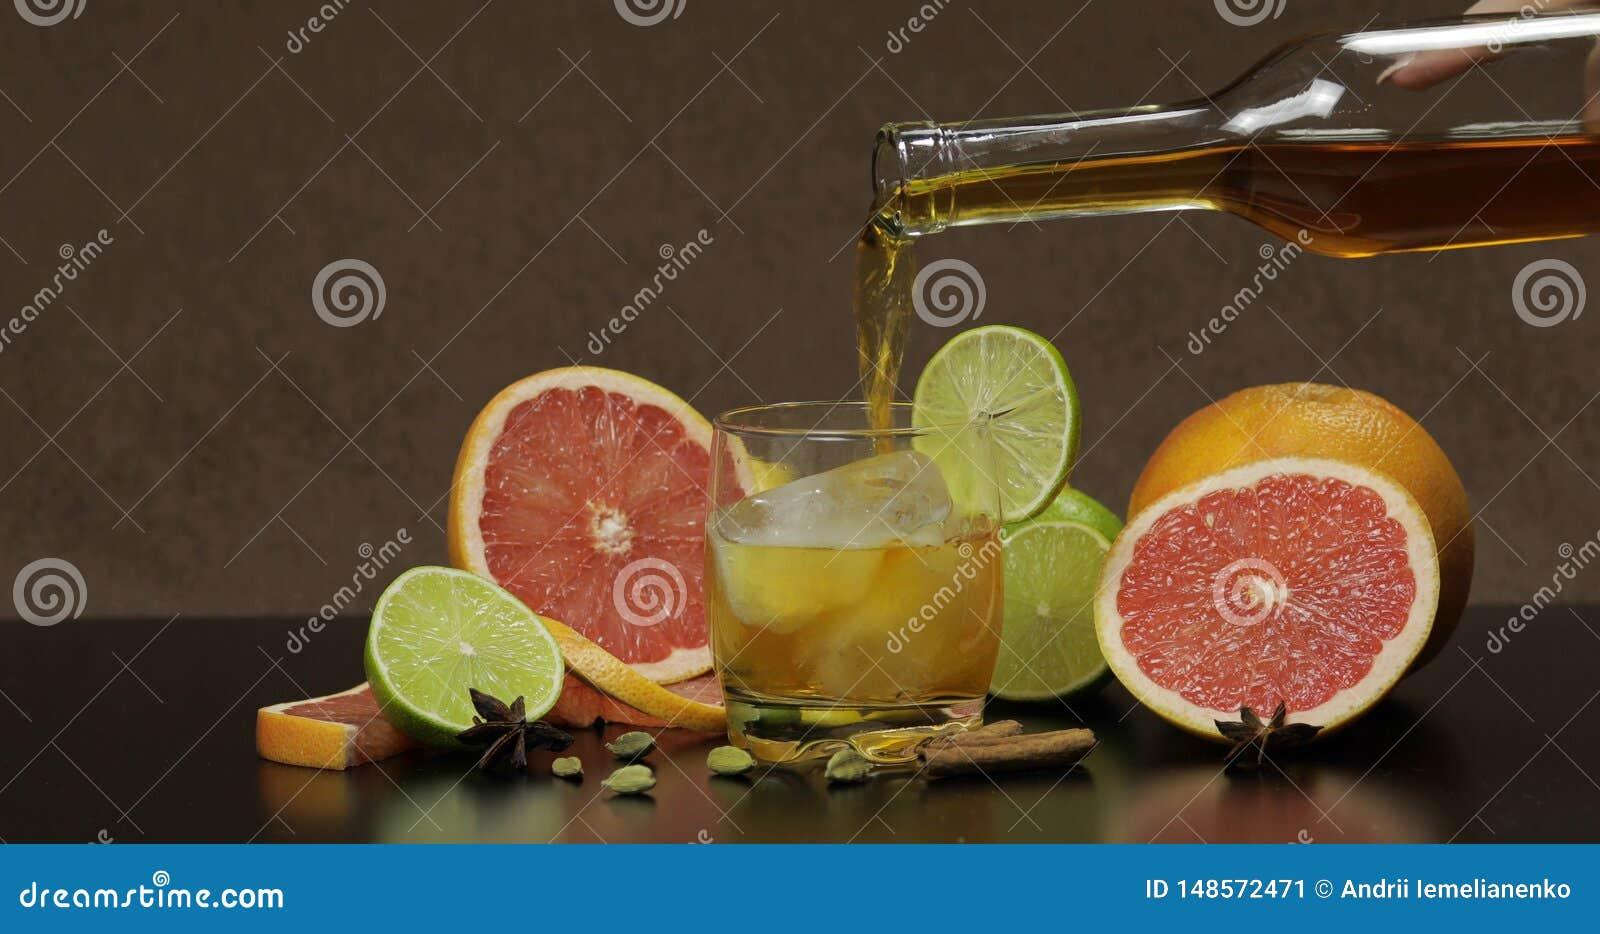 Pour whiskey, cognac, liqueur from a bottle into a glass cup